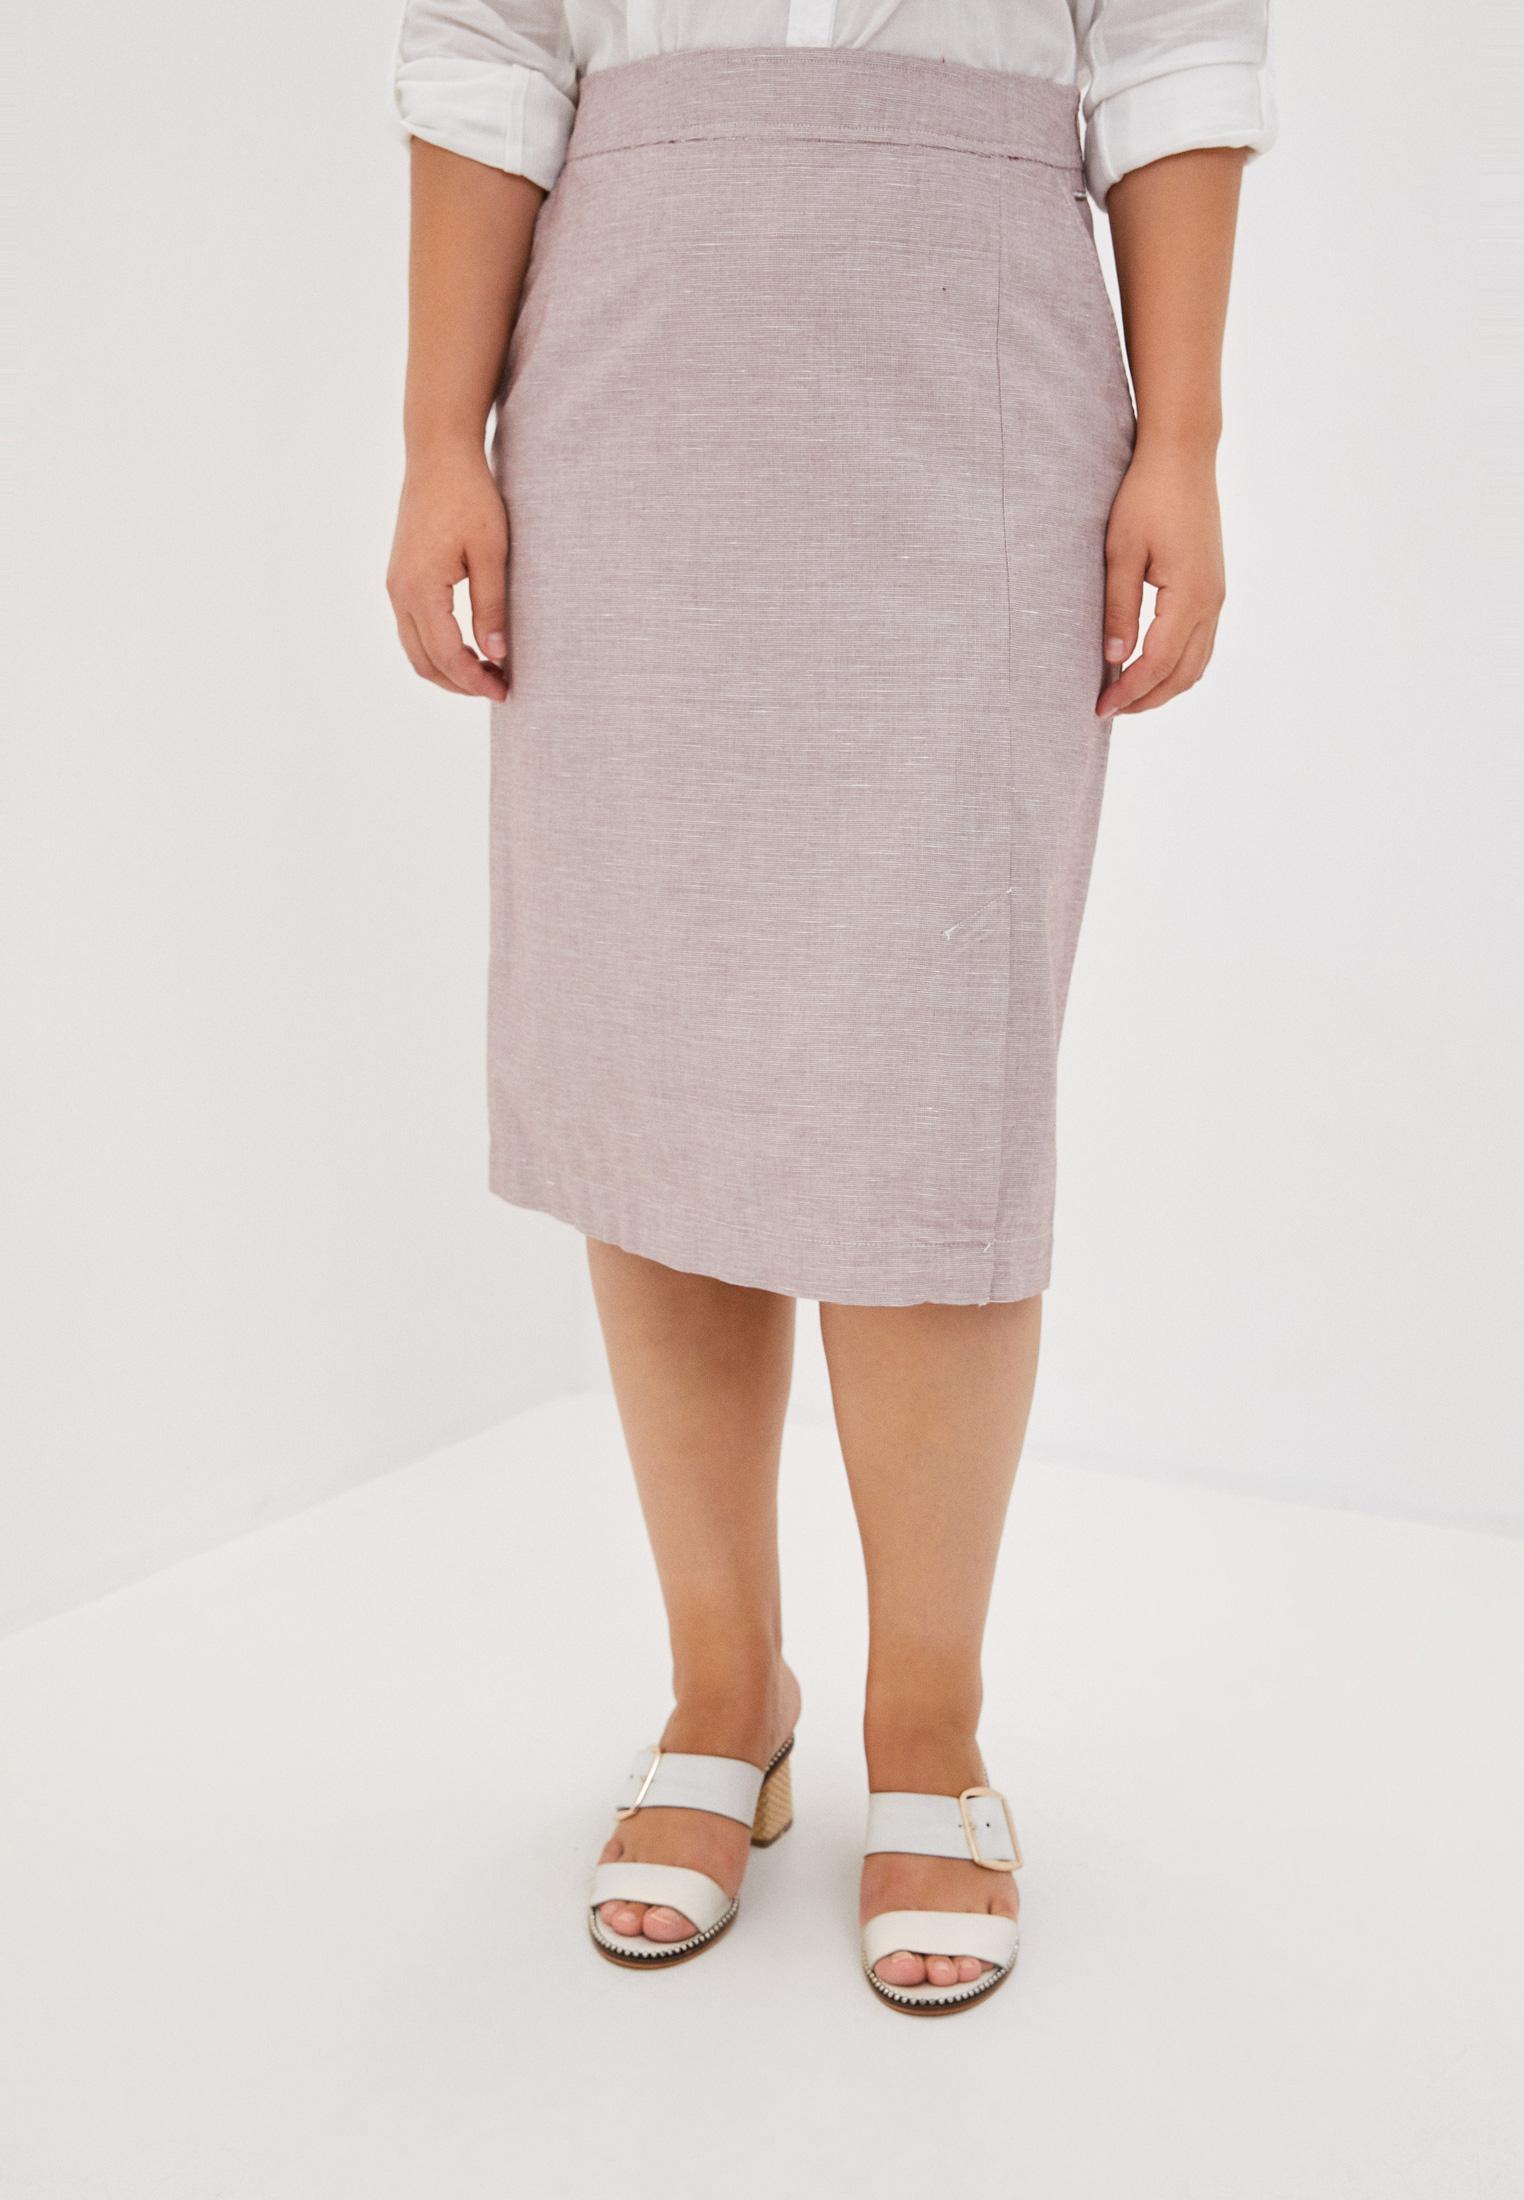 Прямая юбка Finn Flare (Фин Флаер) S19-12042